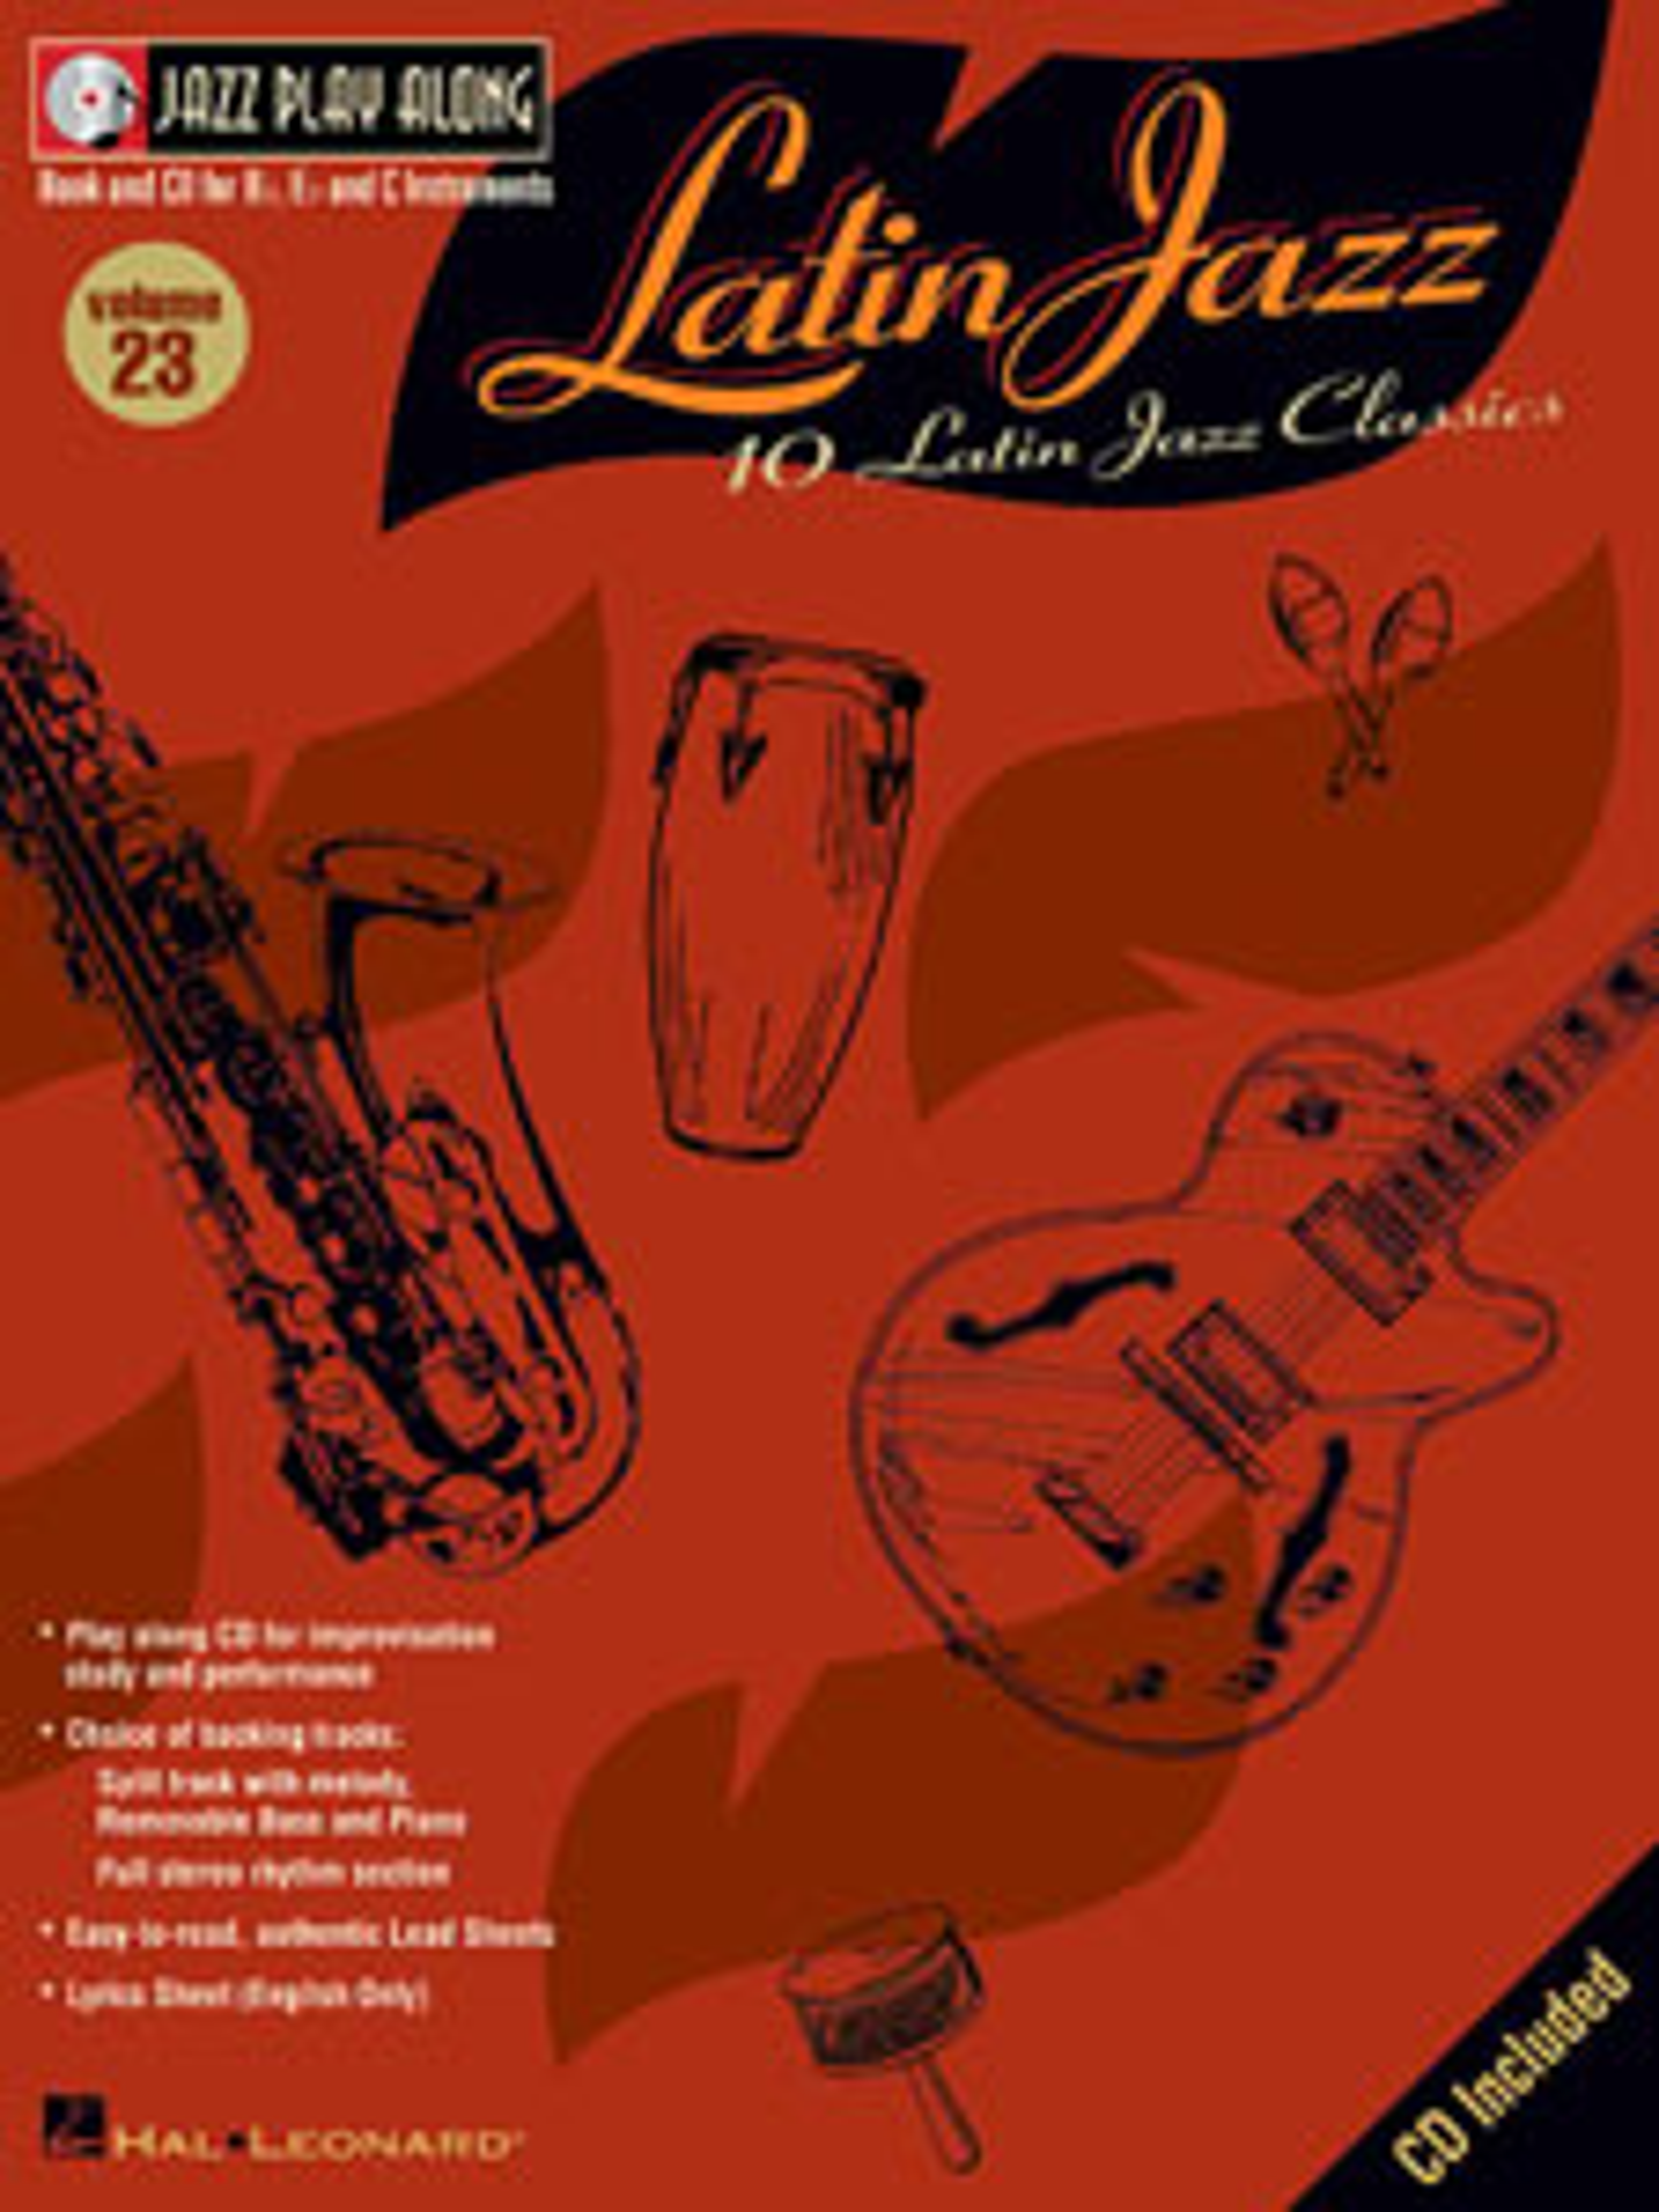 Jazz Play-Along Volume  23-Latin Jazz